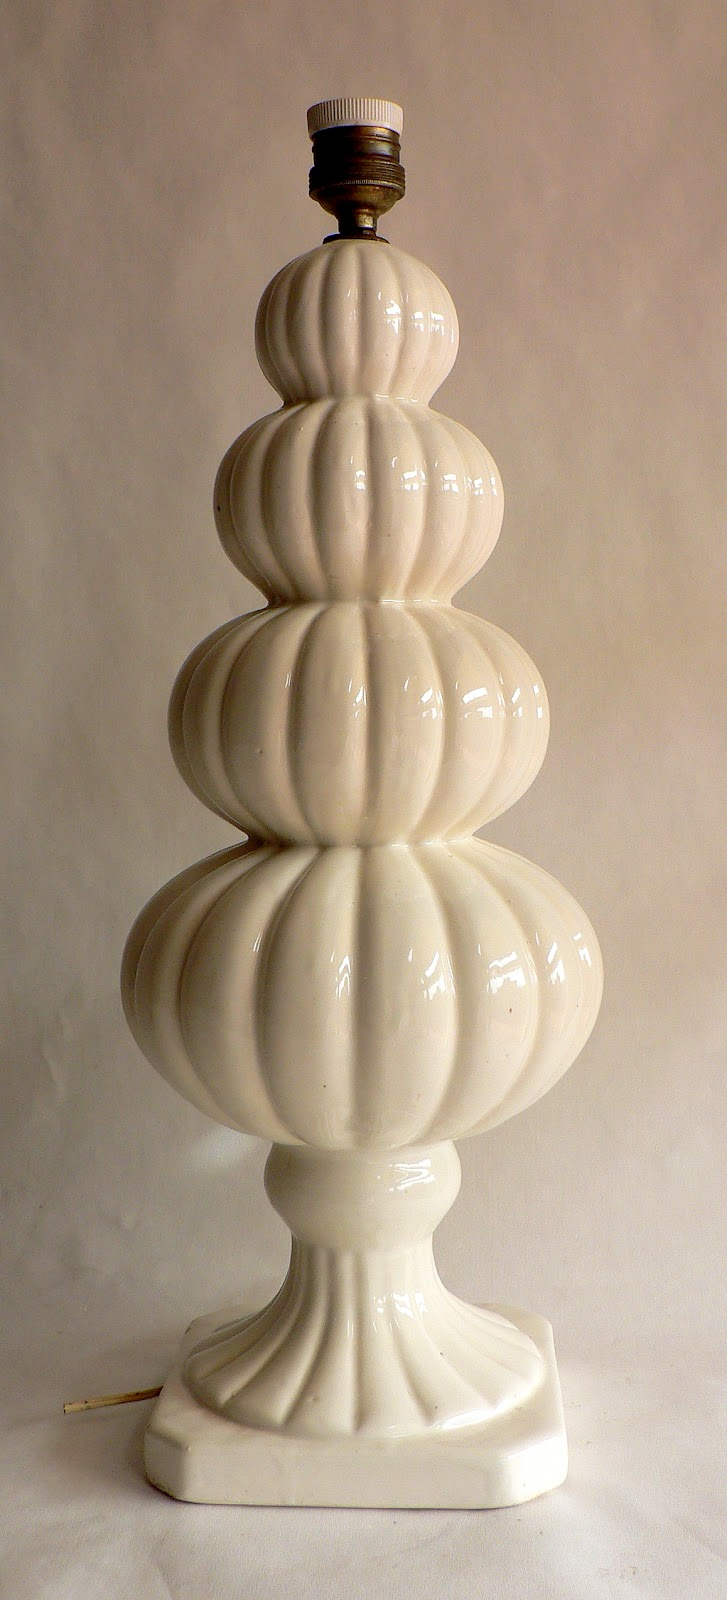 Vintage kitsch siglo xx lampara de ceramica de alcora o - Lamparas de ceramica ...